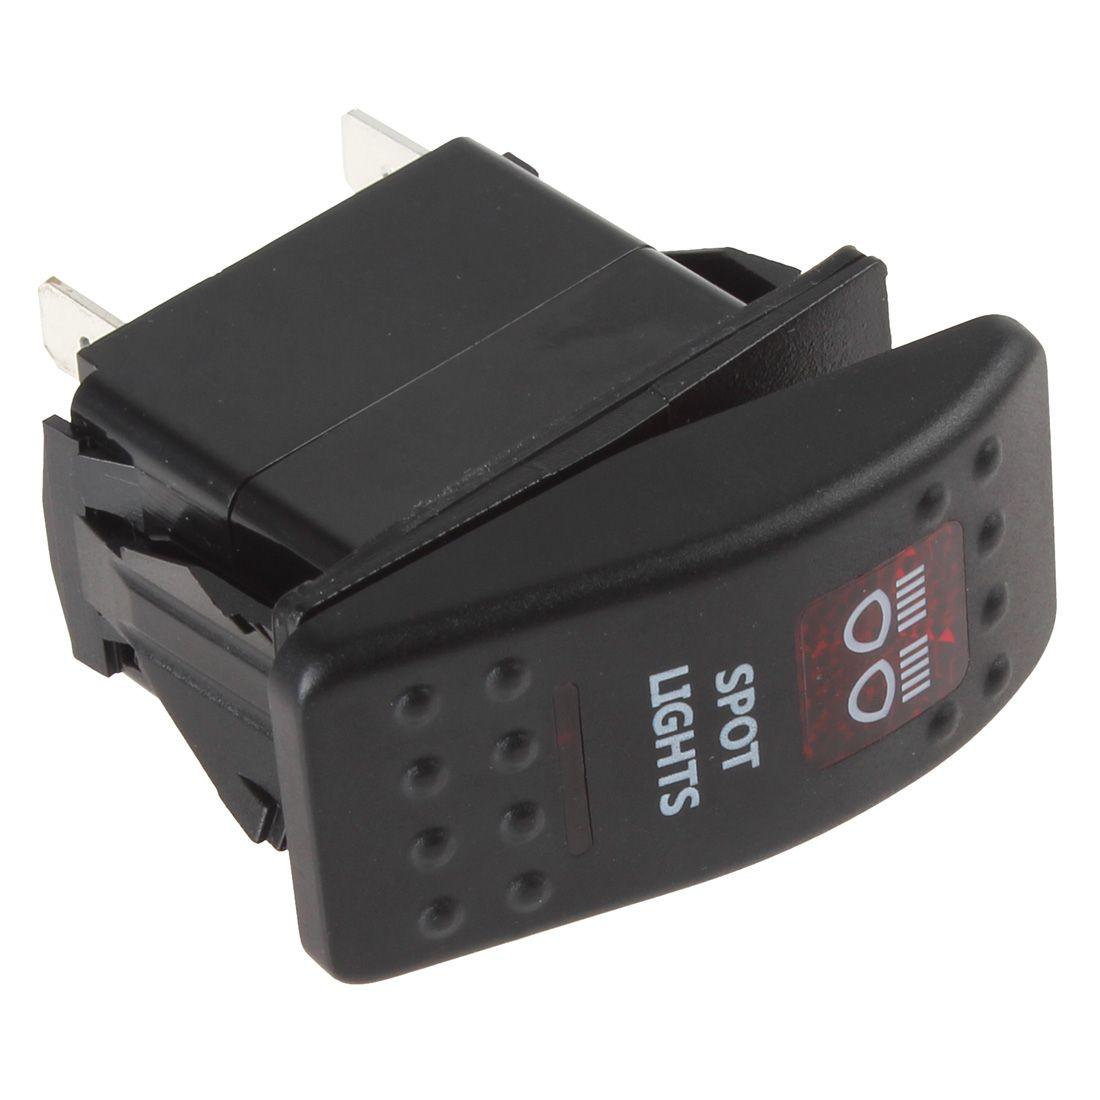 A estrenar 12V 20A Luz indicadora LED roja impermeable Carling Style Spot Light Interruptor basculante CEC_916